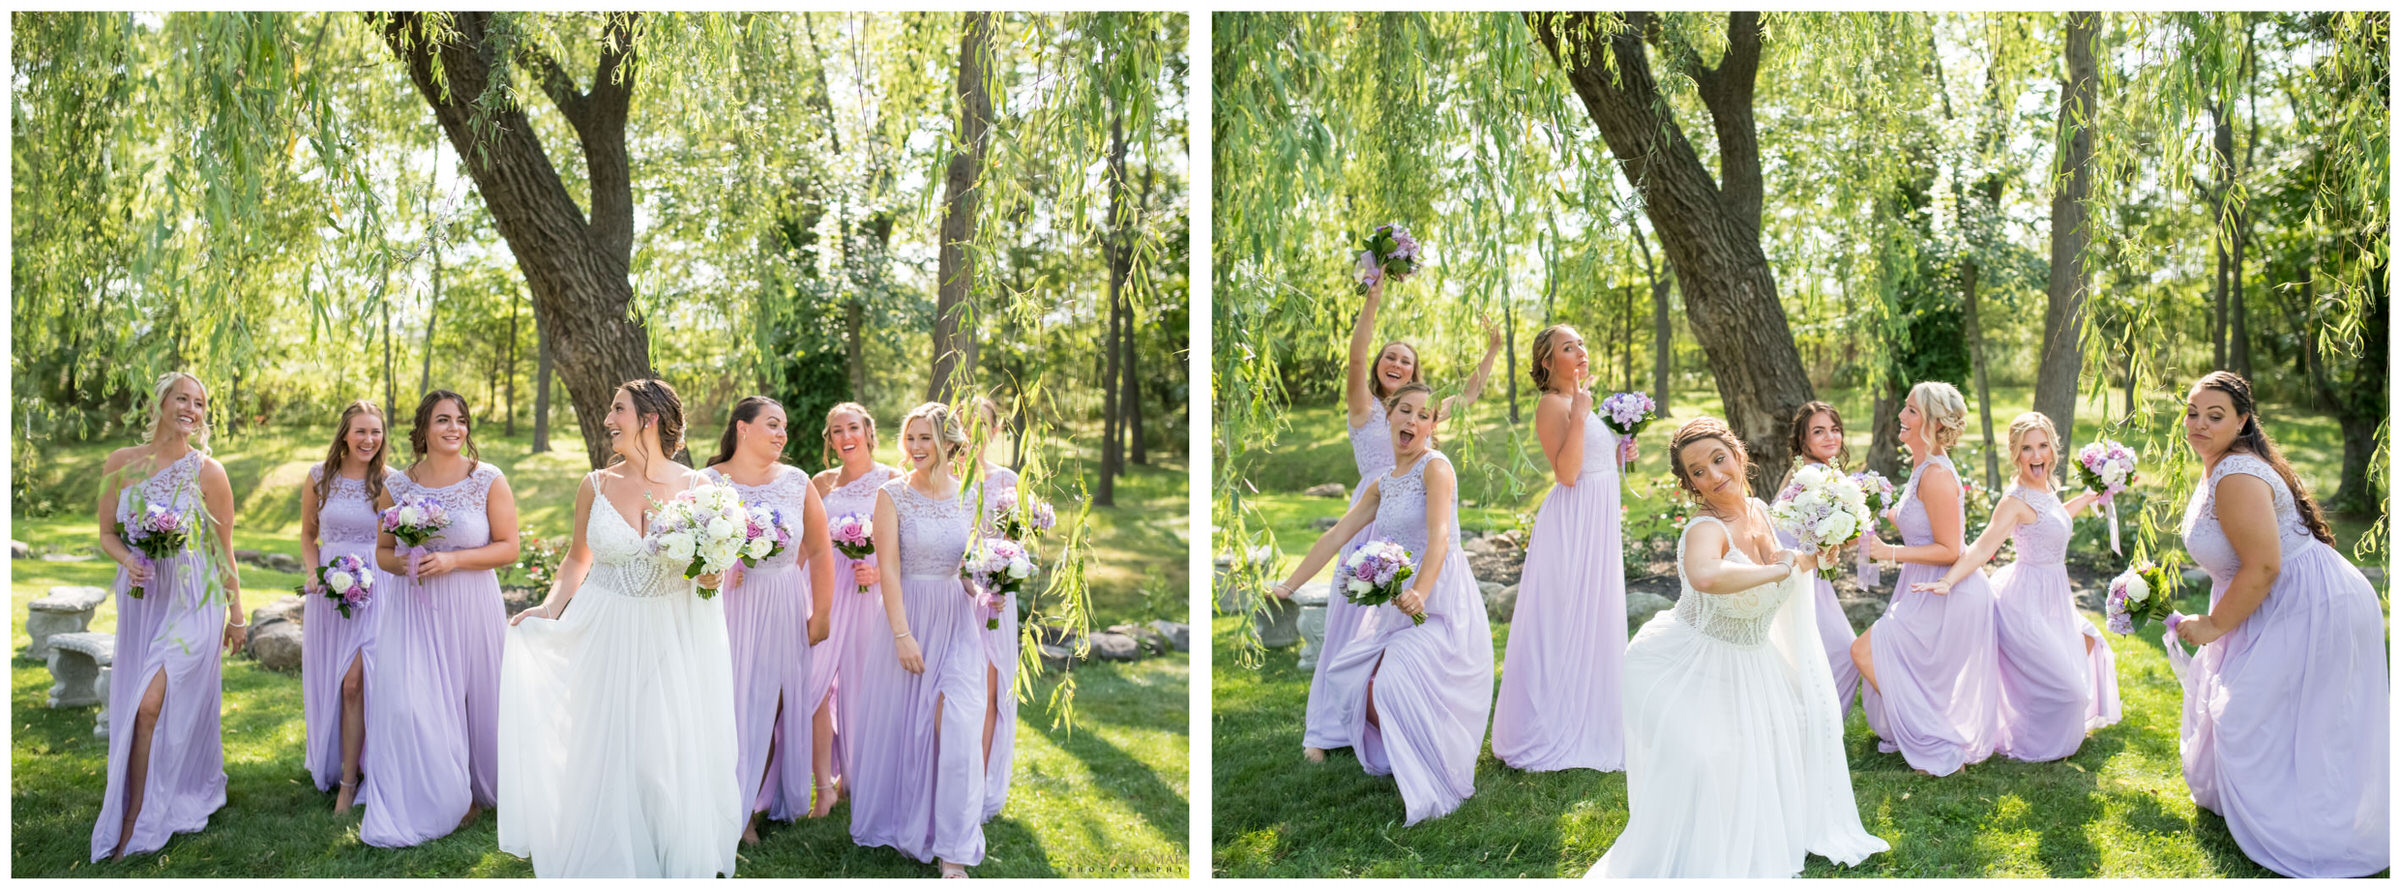 Cassondre Mae Photography Villa Venezia Wedding Photographer 20.jpg